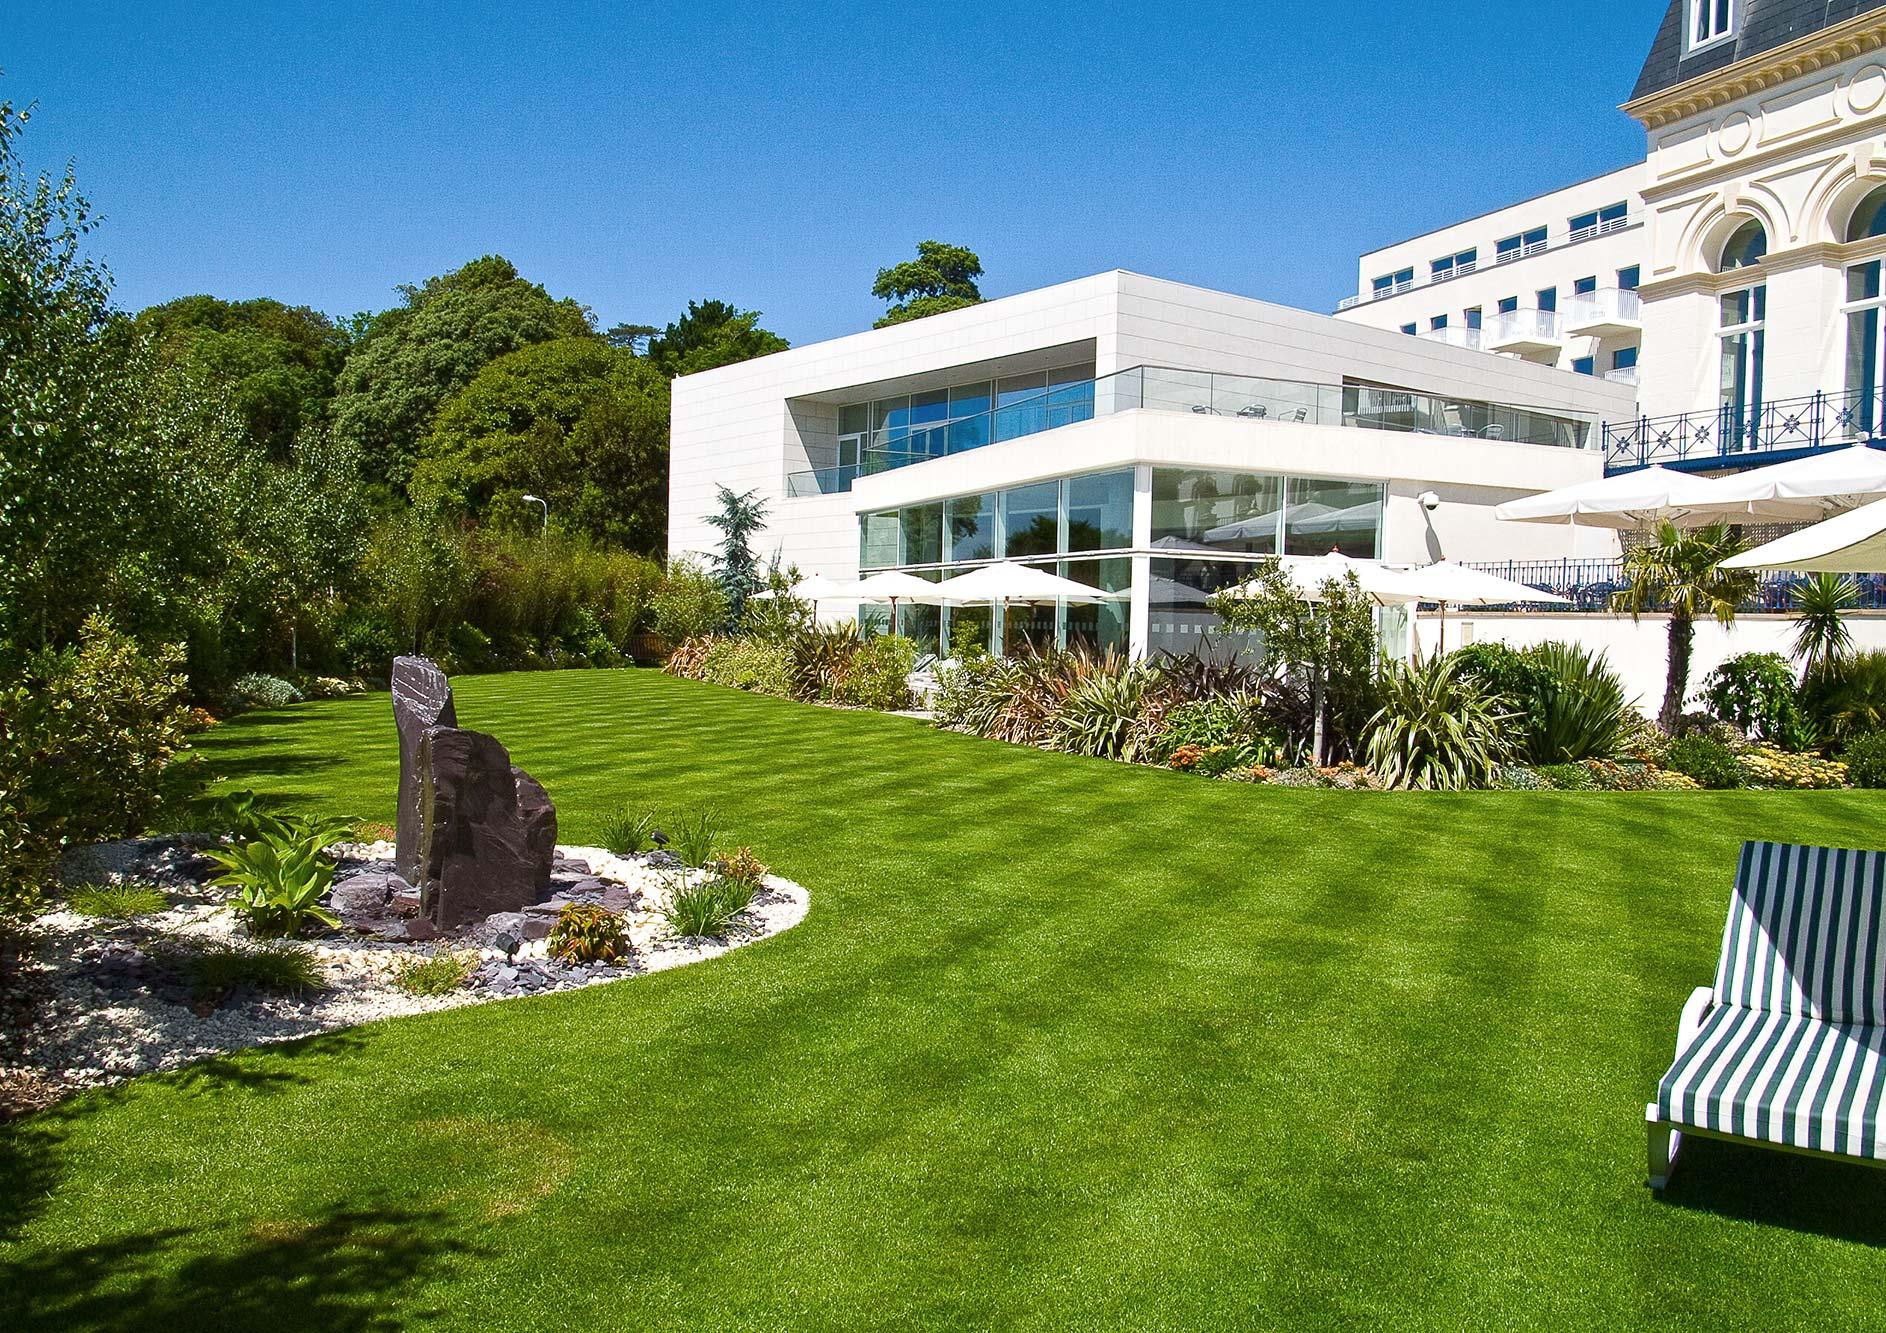 HoteldeFrance Garden